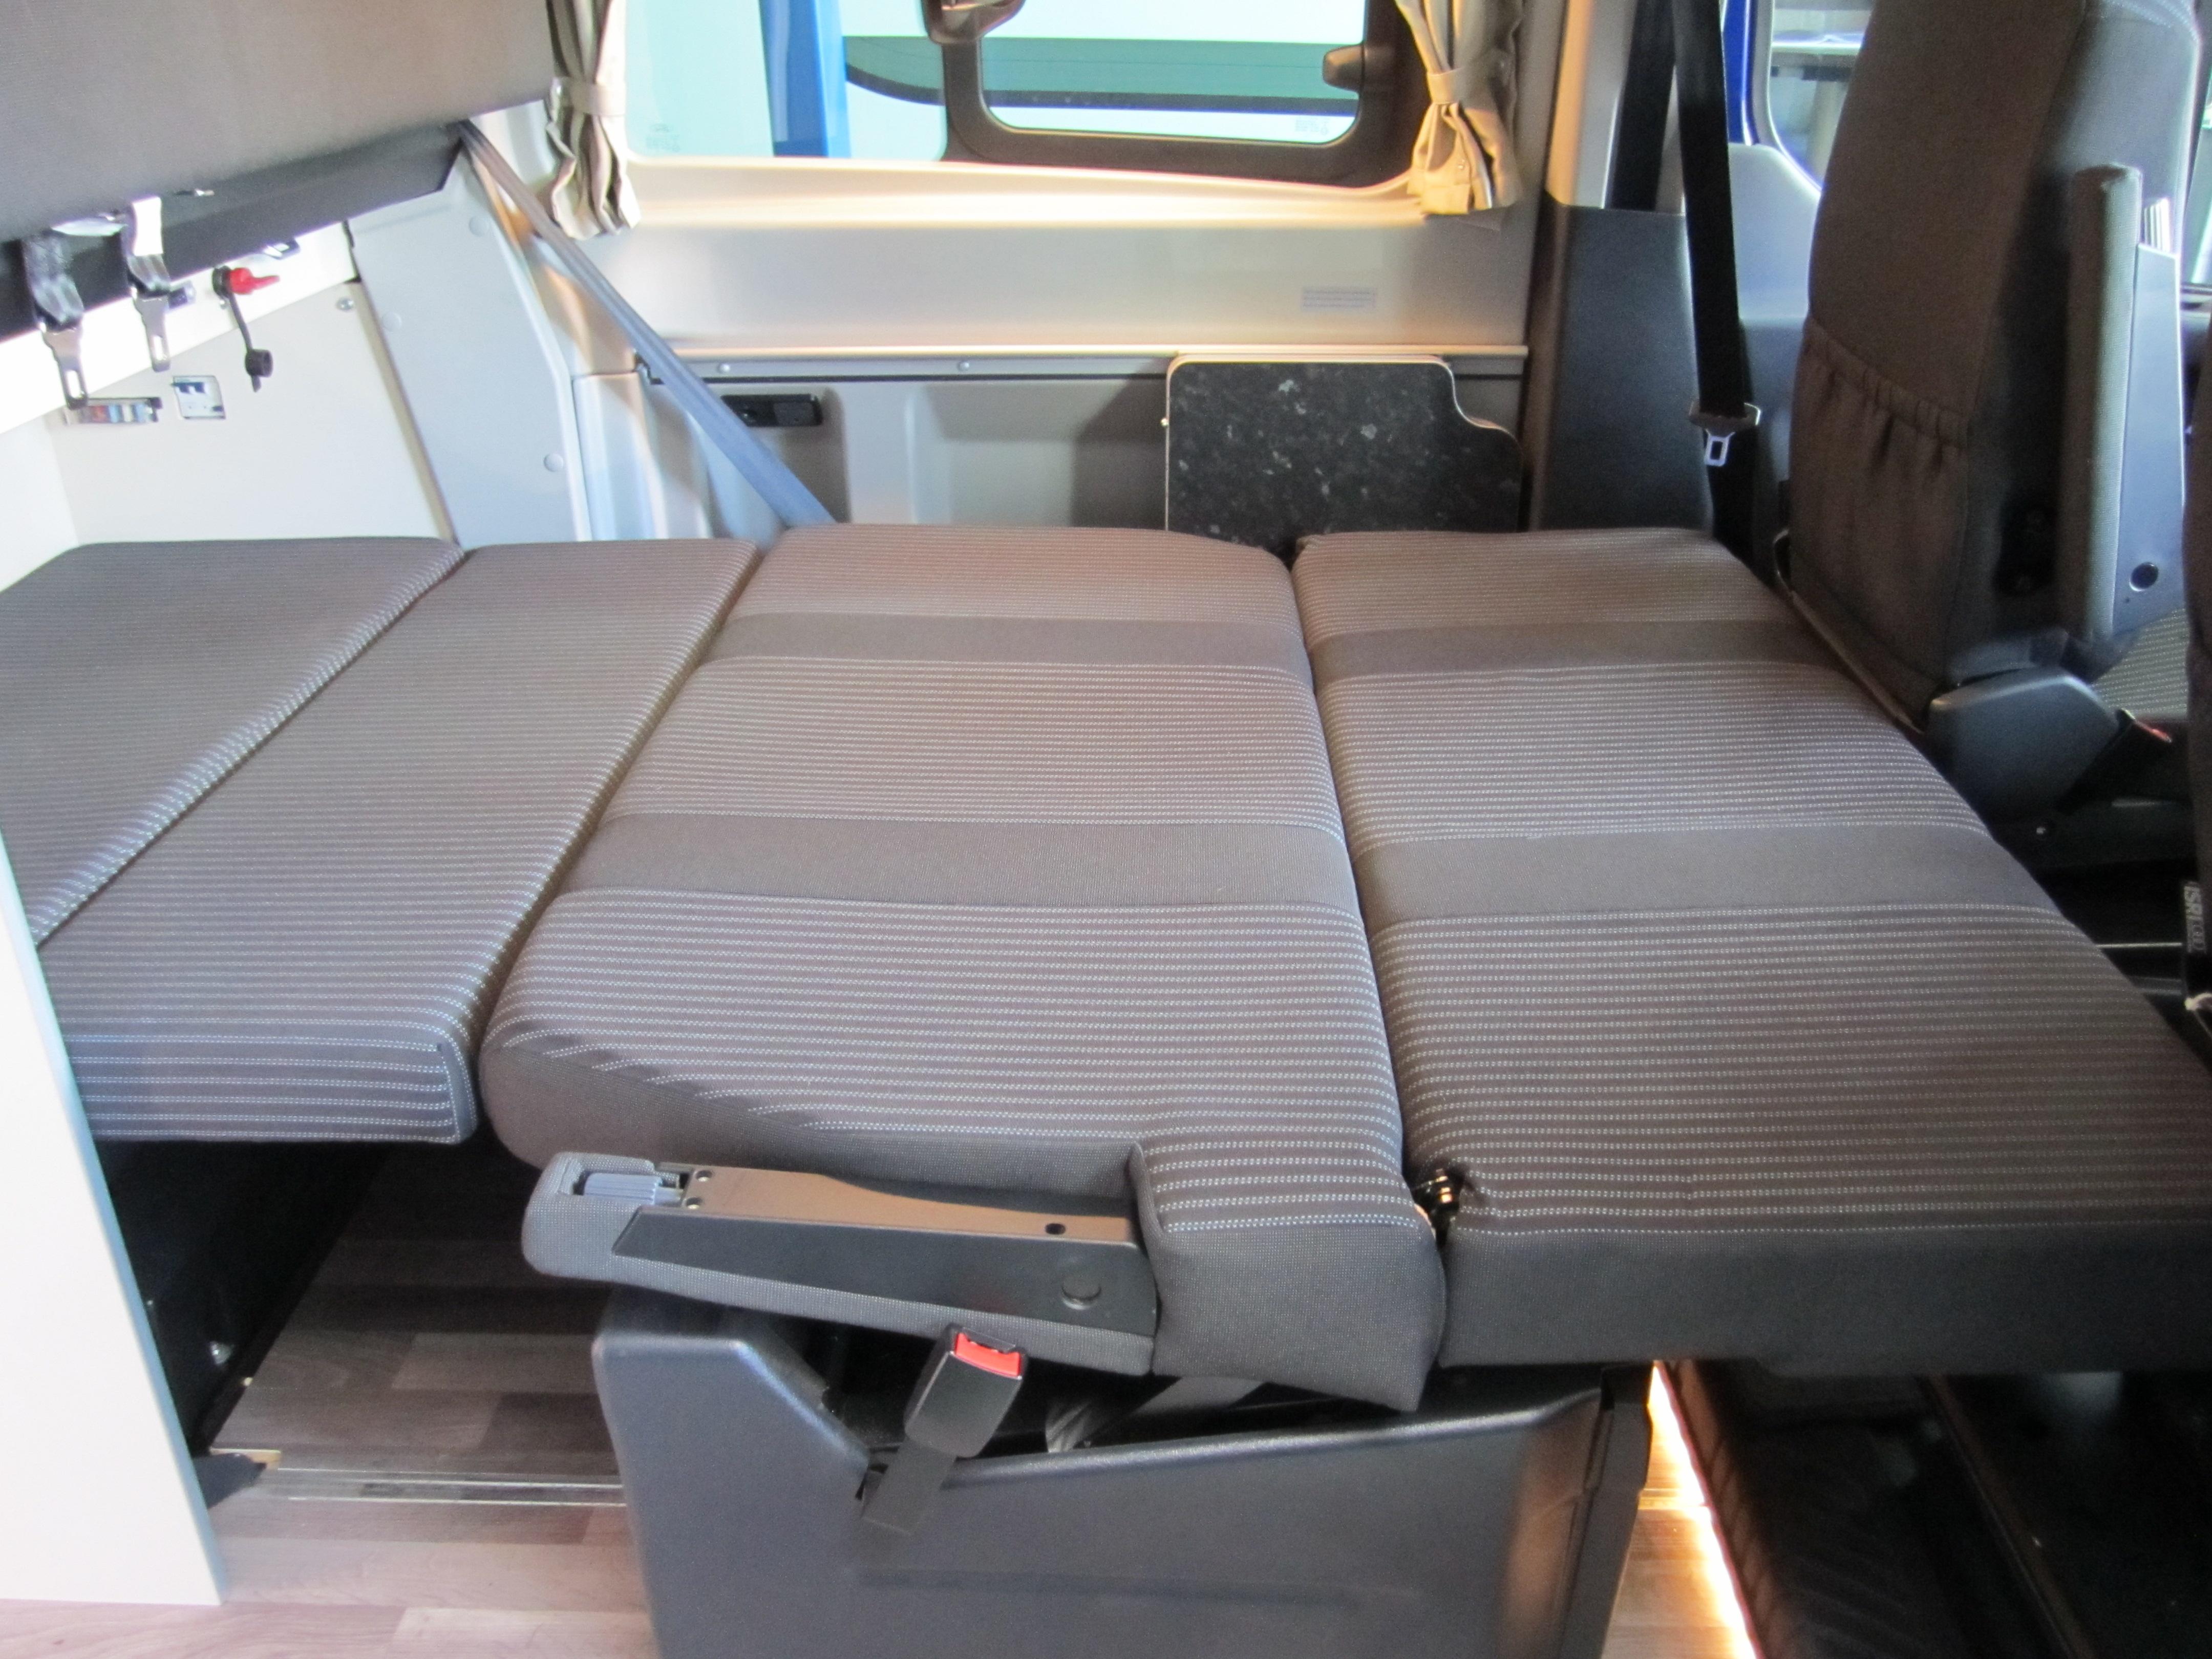 2016 Ford Westfalia Ford Nugget Campervan Blue 2 2l Diesel Manual